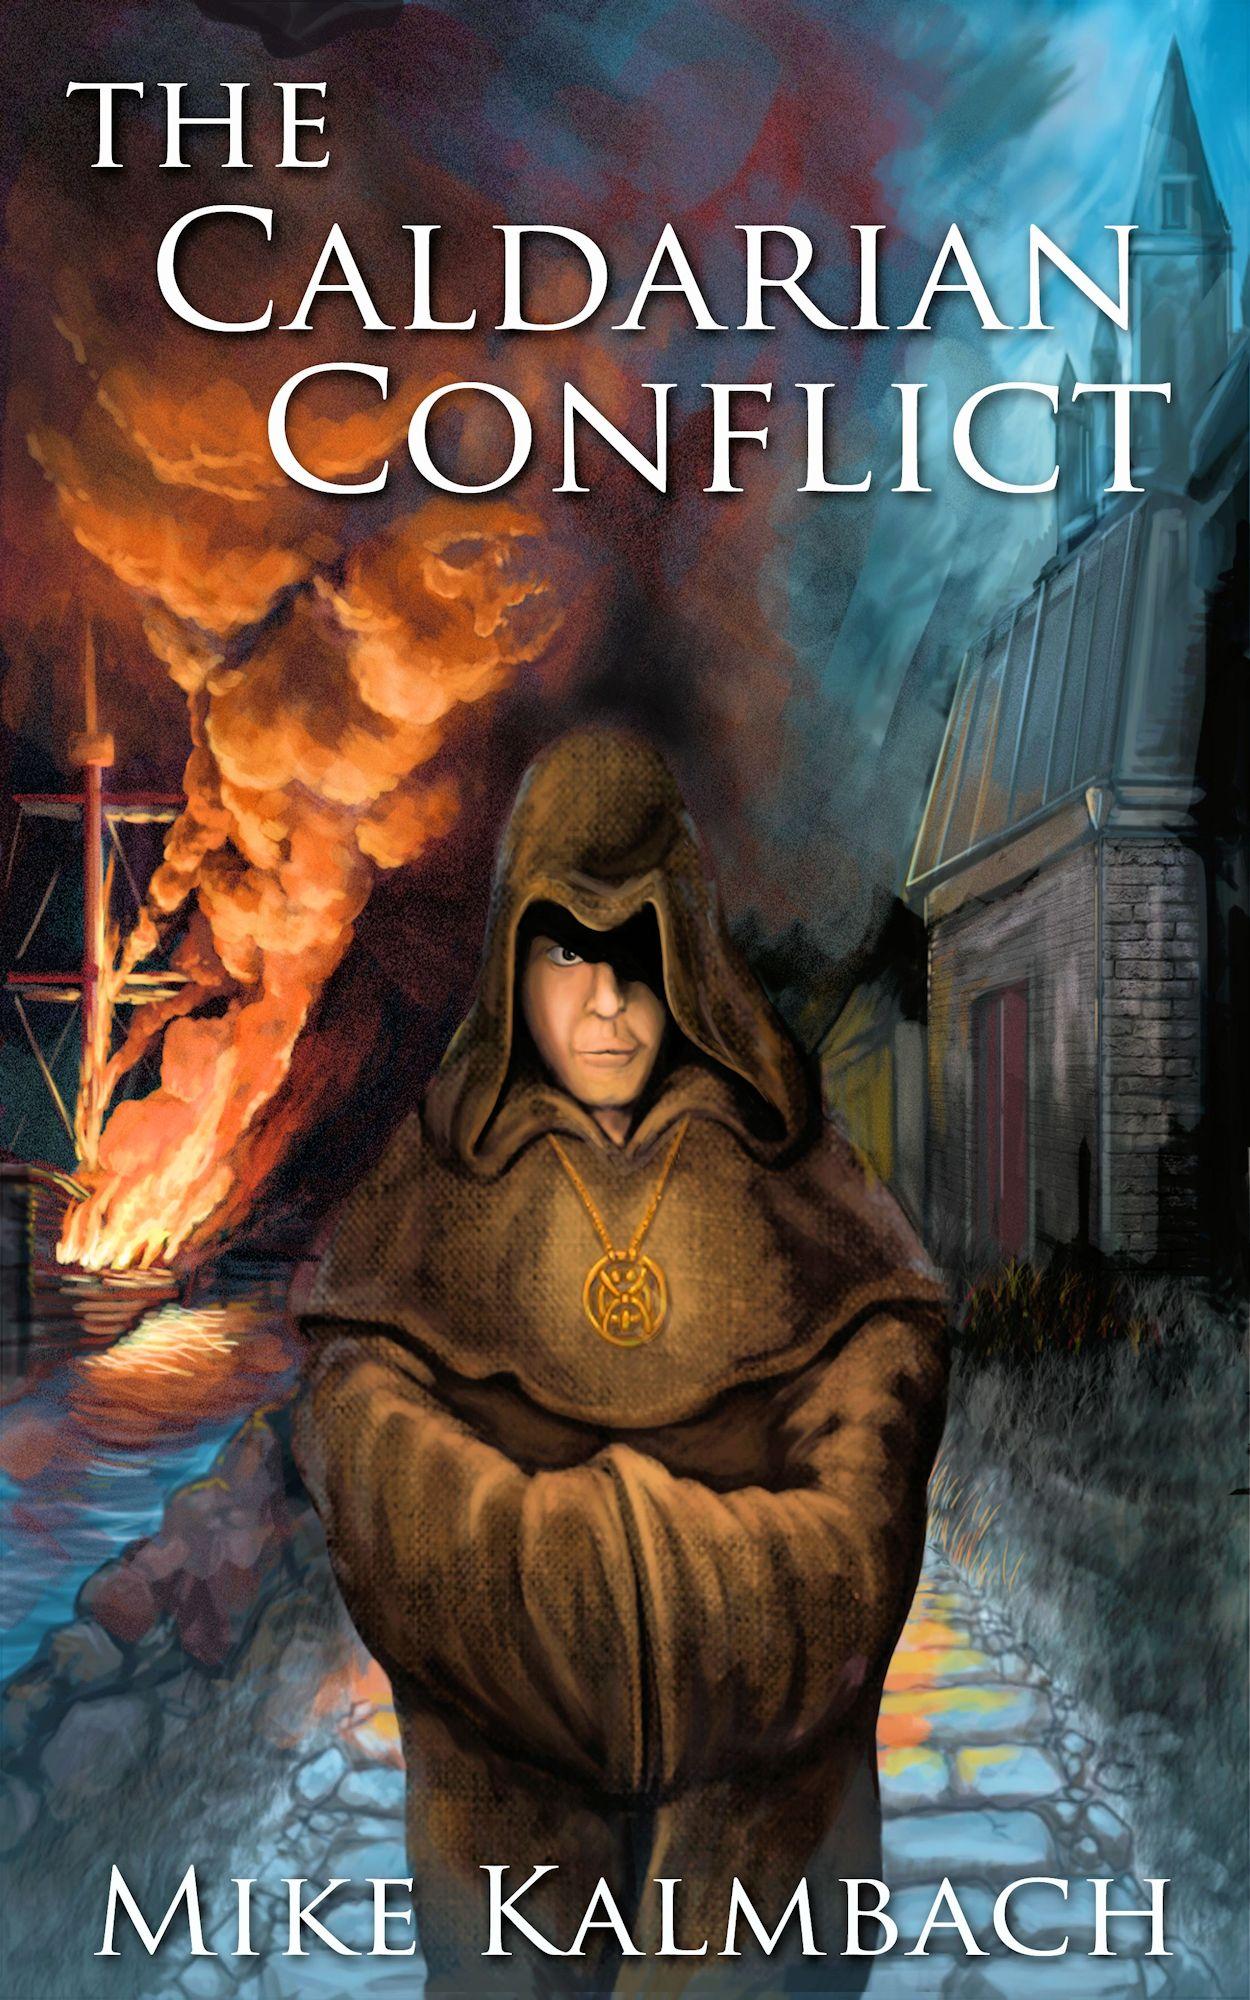 The Caldarian Conflict